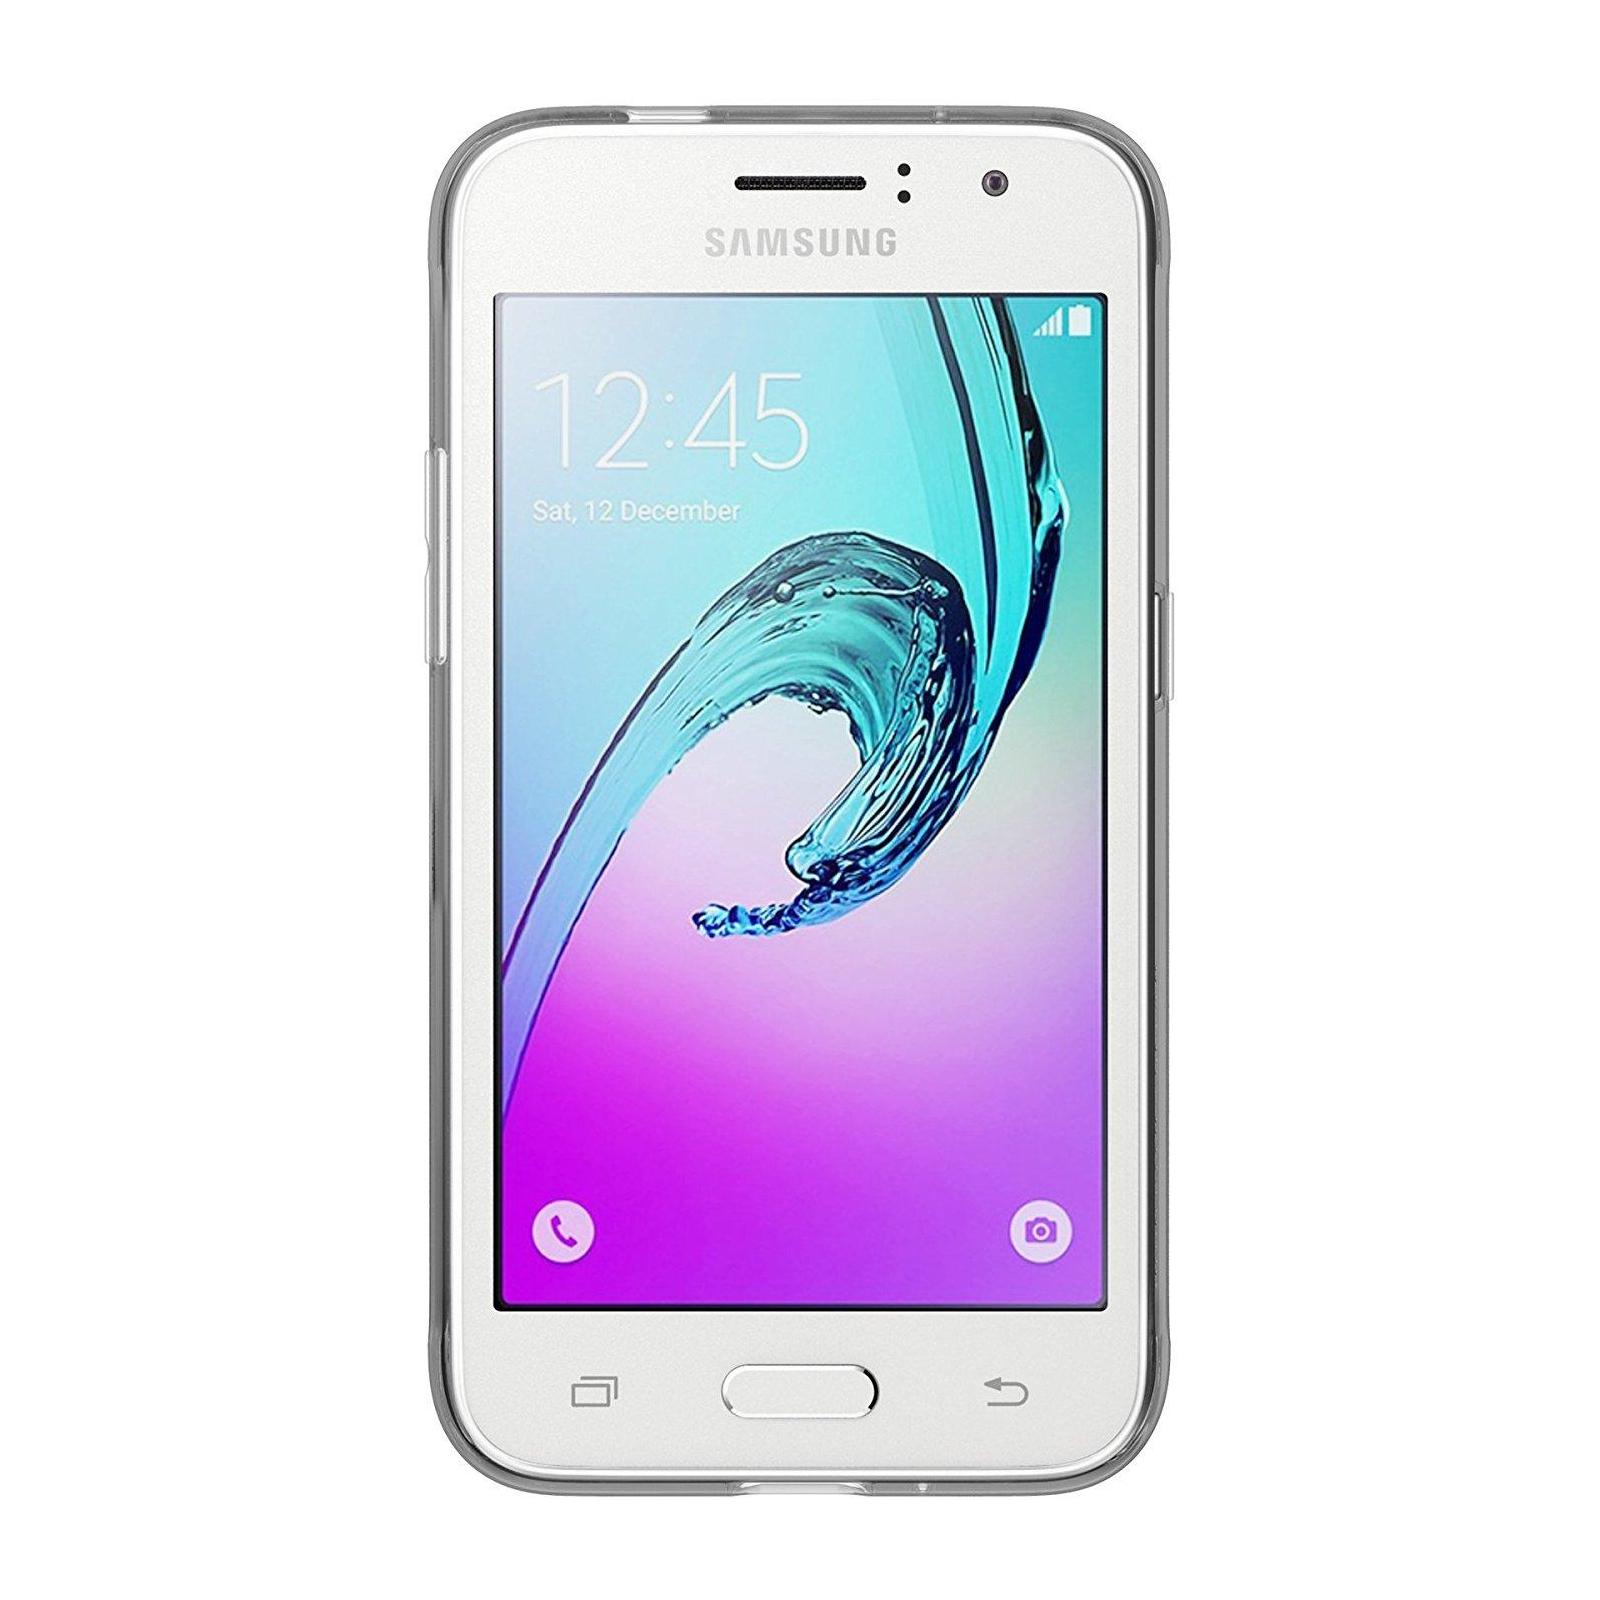 Чехол для моб. телефона SmartCase Samsung Galaxy J3 /J320 TPU Clear (SC-J320) изображение 4